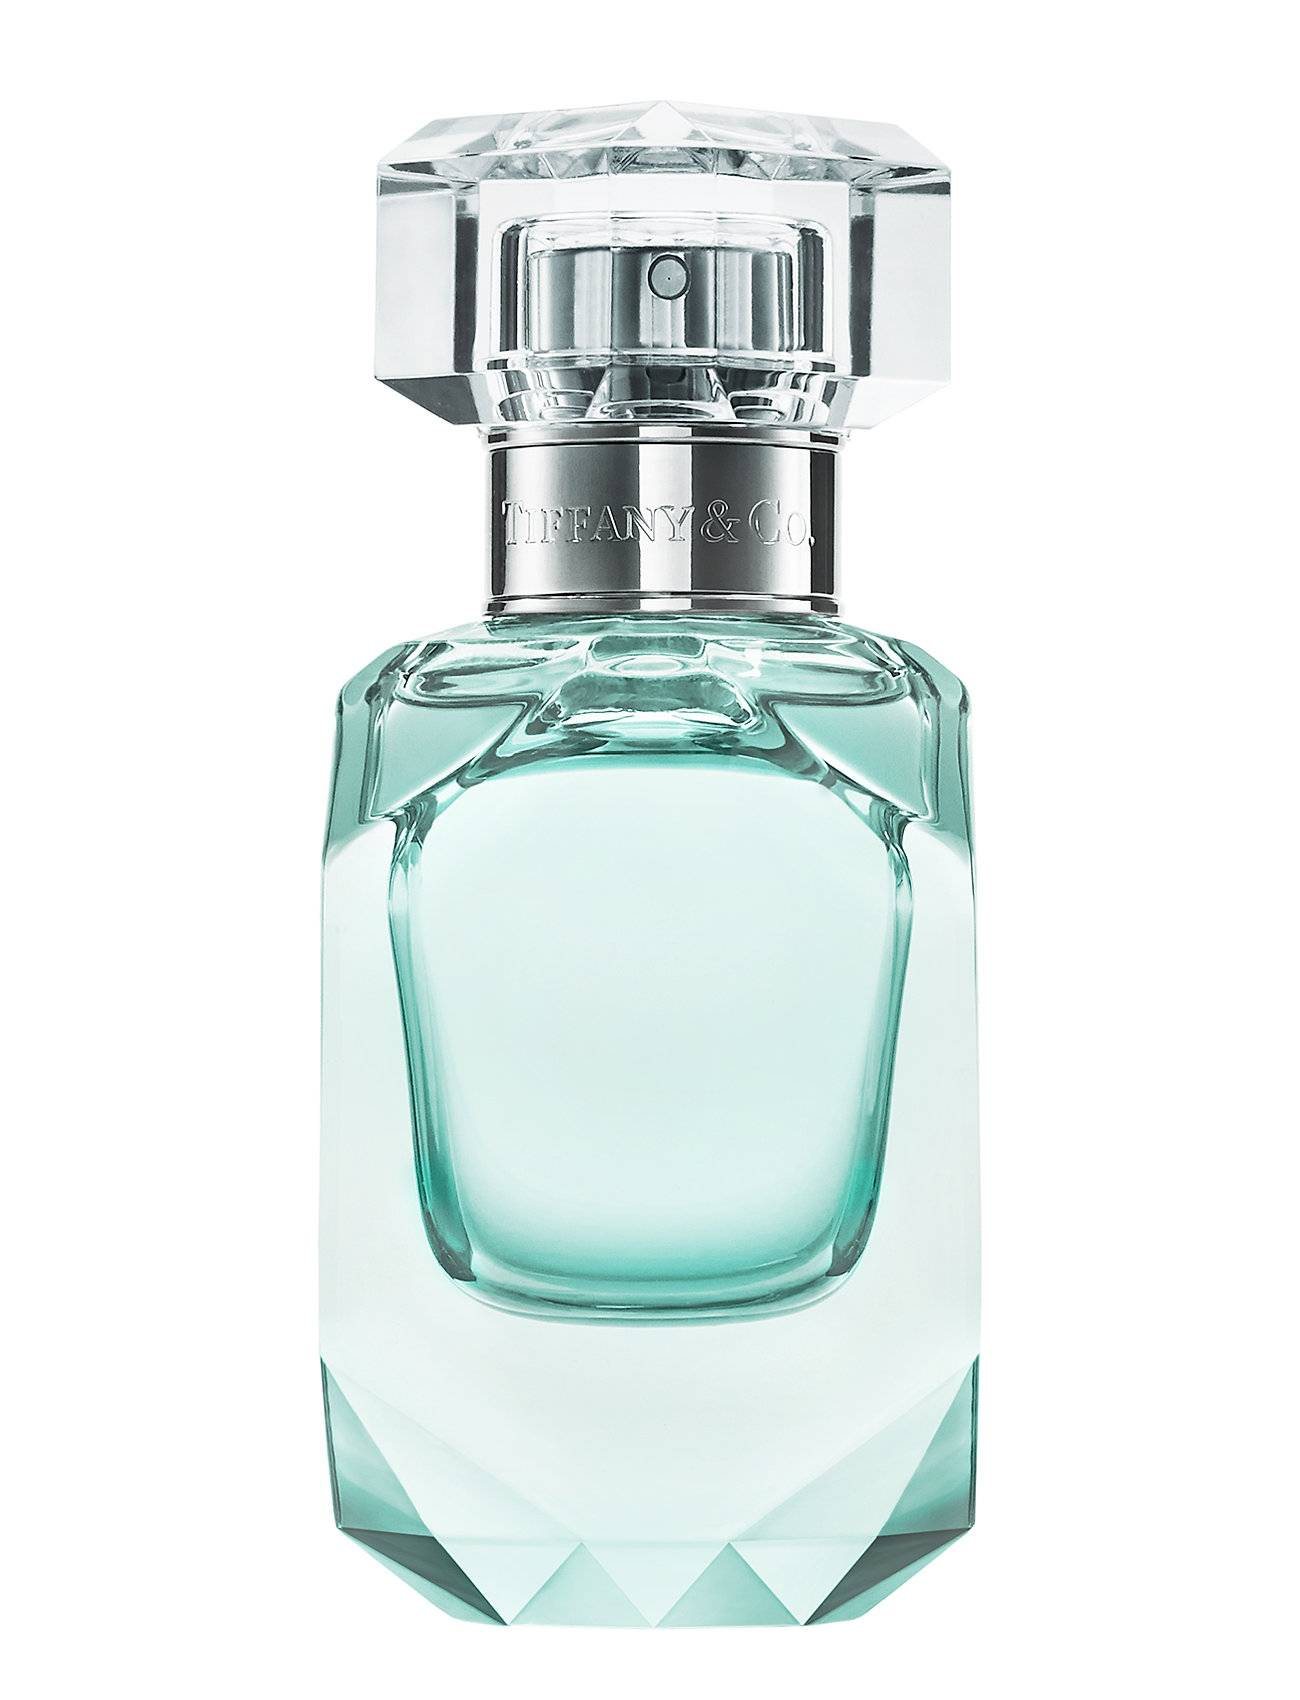 Tiffany & Co Intense Eau Deparfum Hajuvesi Eau De Parfum